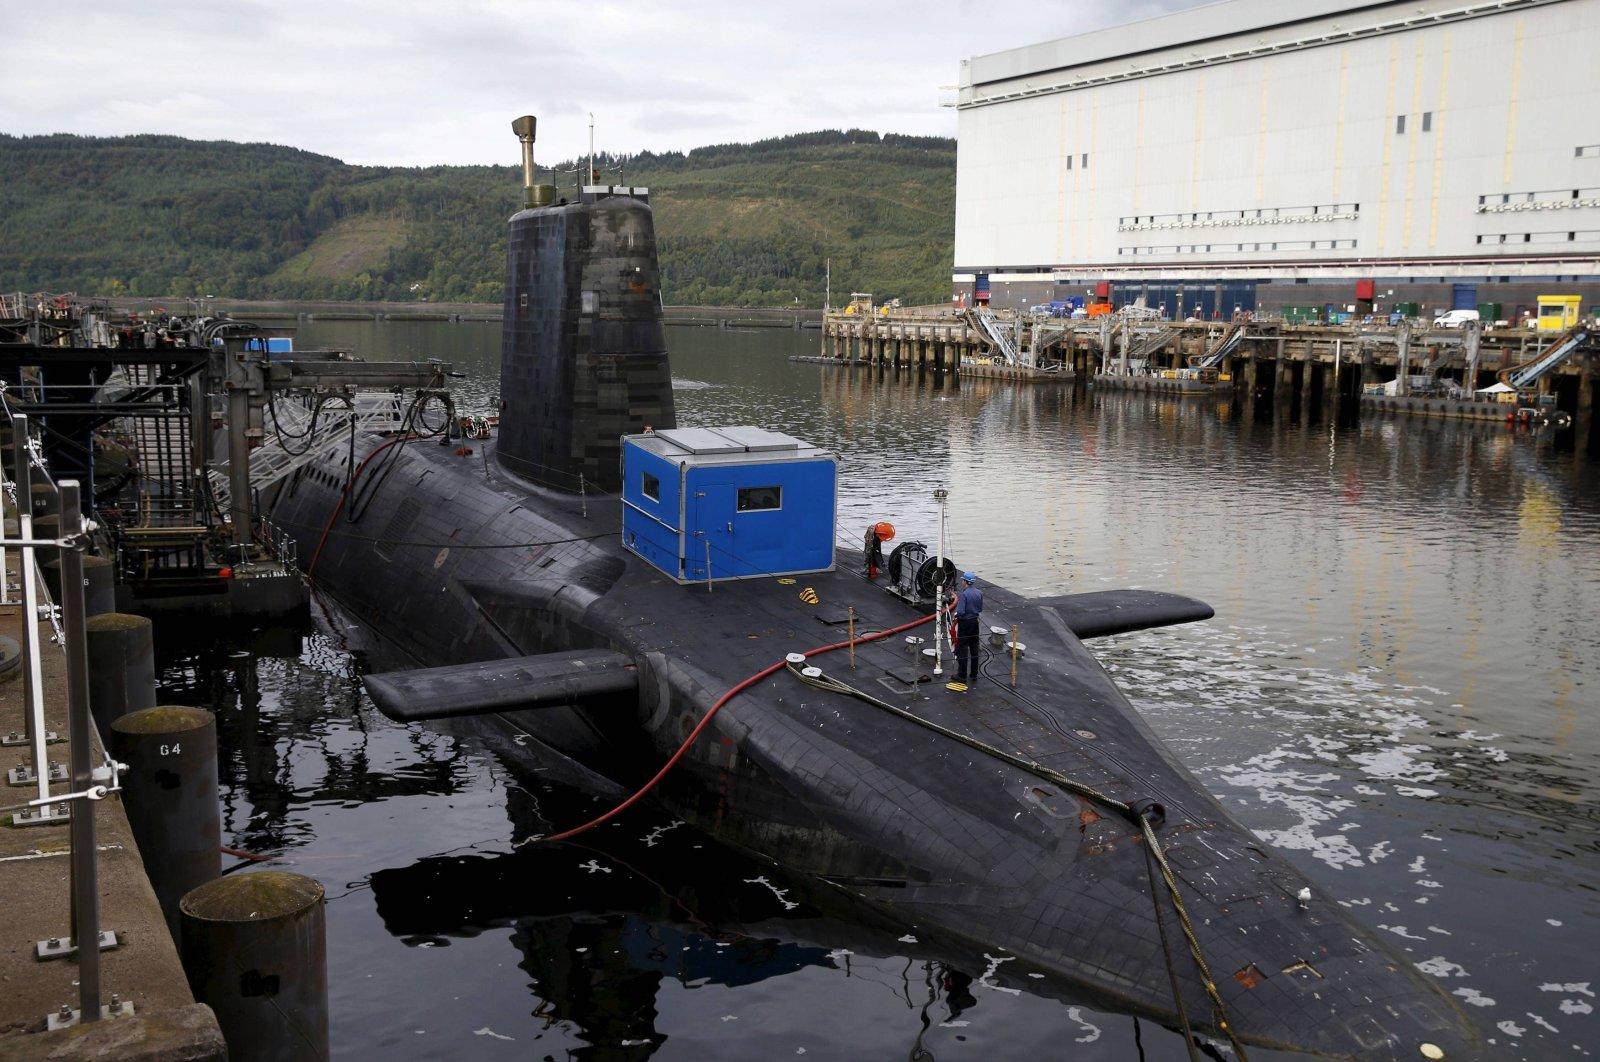 A nuclear submarine is seen at the Royal Navy's submarine base at Faslane, Scotland, Aug. 31, 2015. (Reuters Photo)